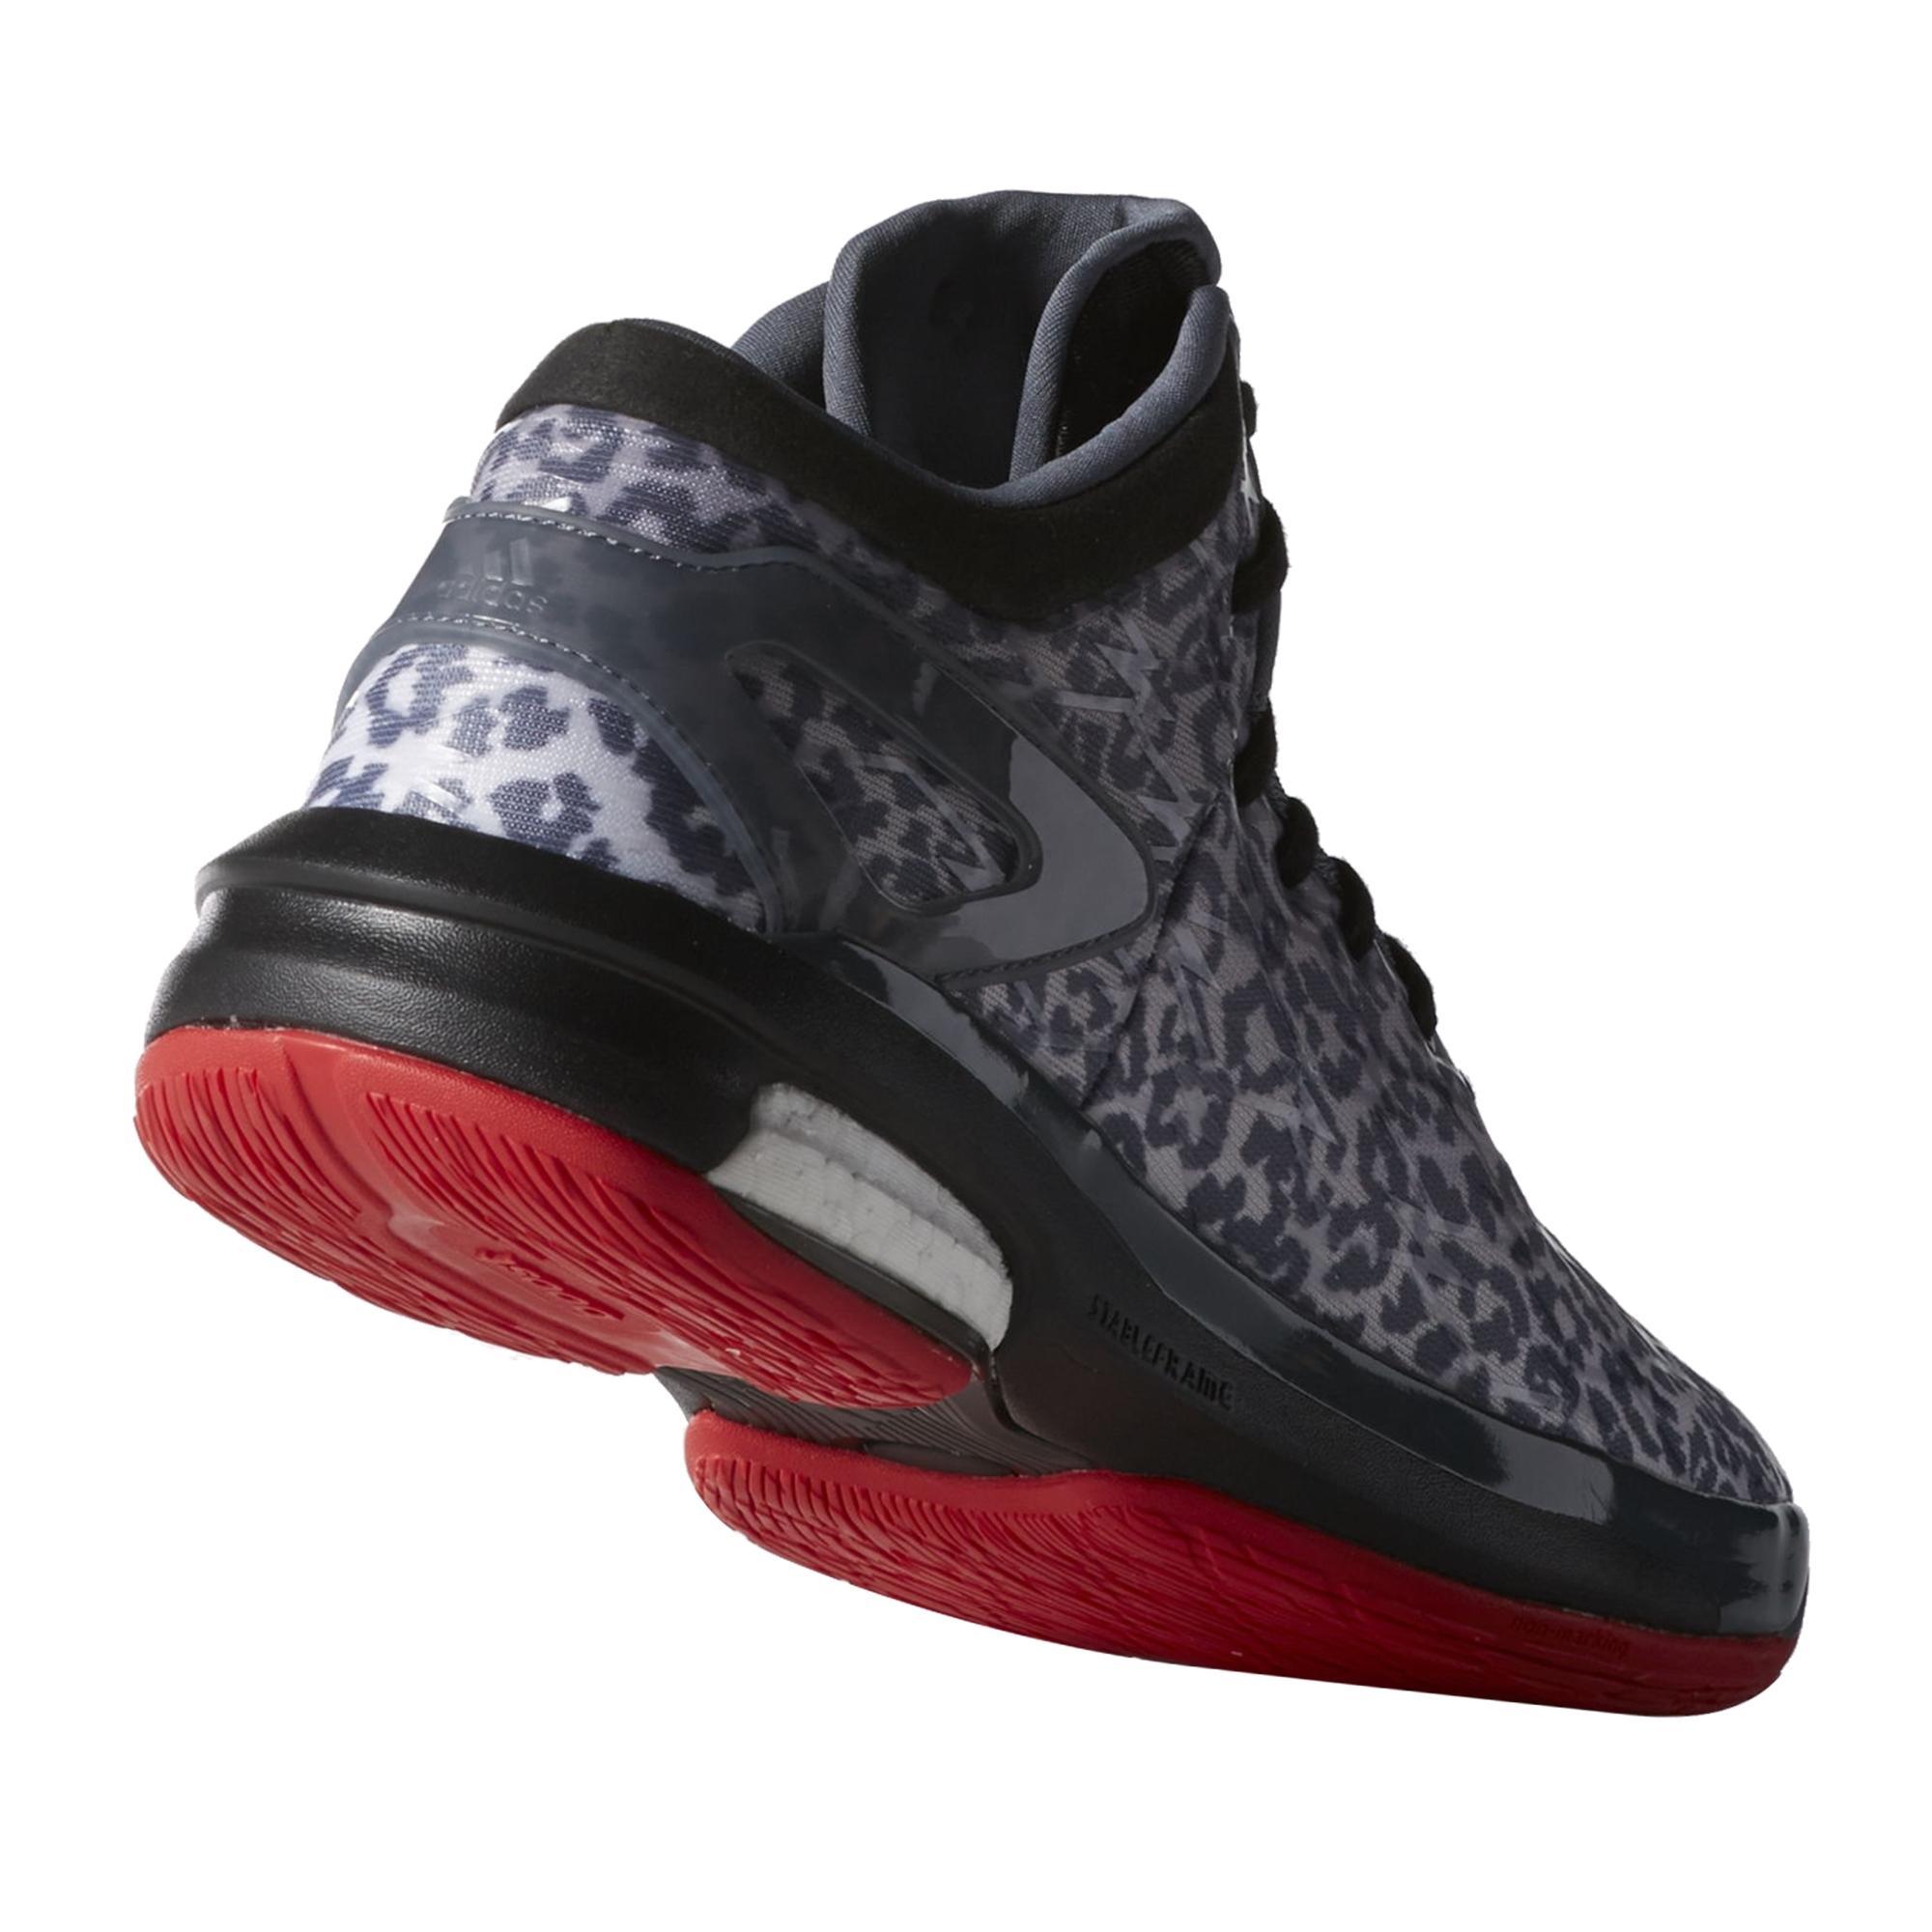 huge discount 83cbd 837f5 adidas Crazy Light Boost Erkek Basketbol Ayakkabısı